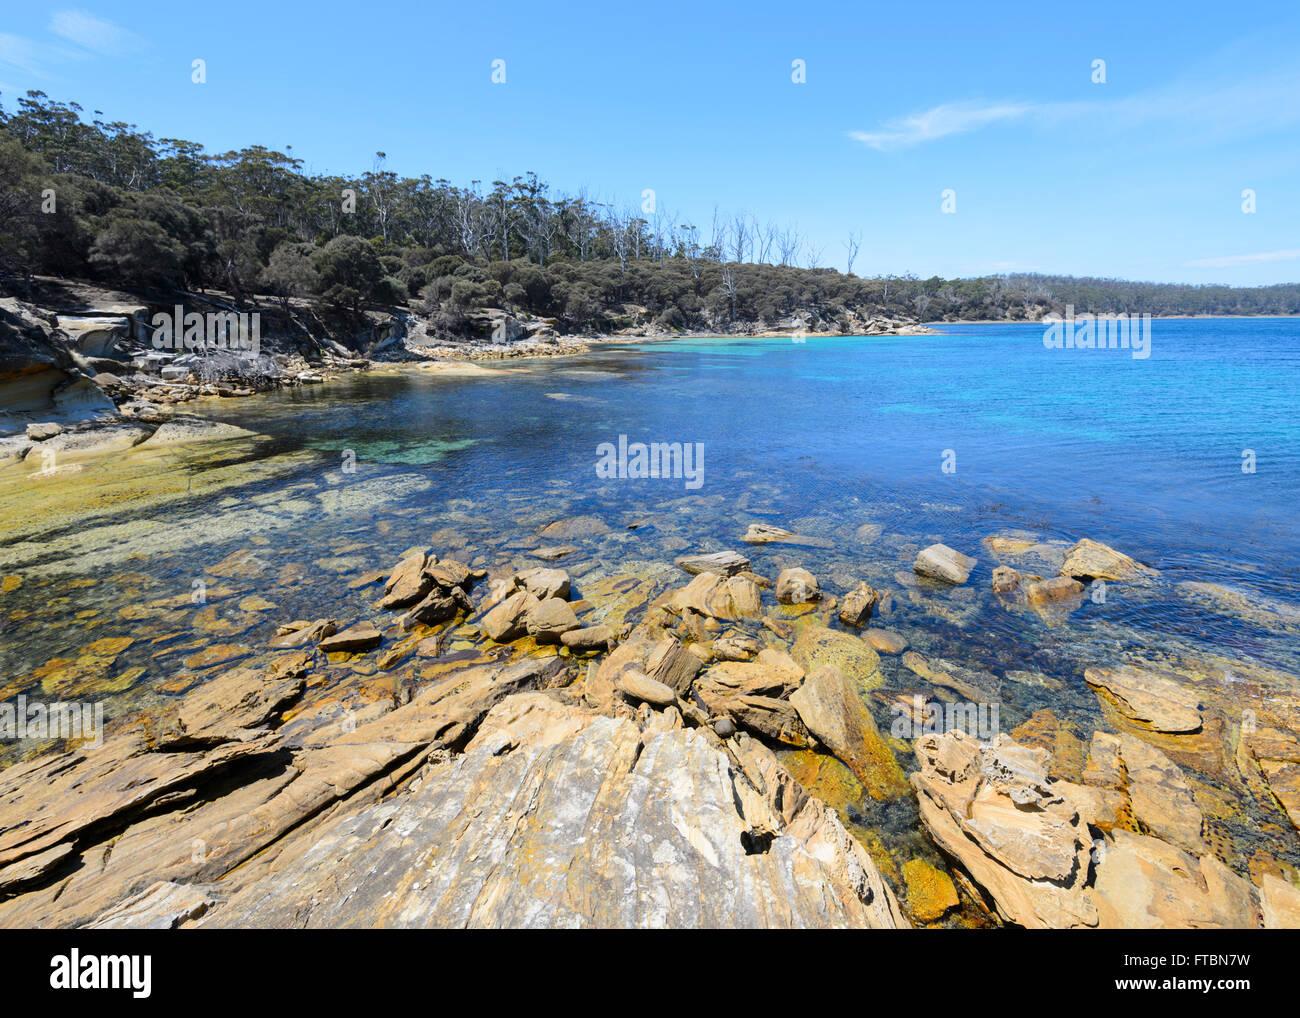 Maria Island National Park, Tasmanien, Australien Stockbild